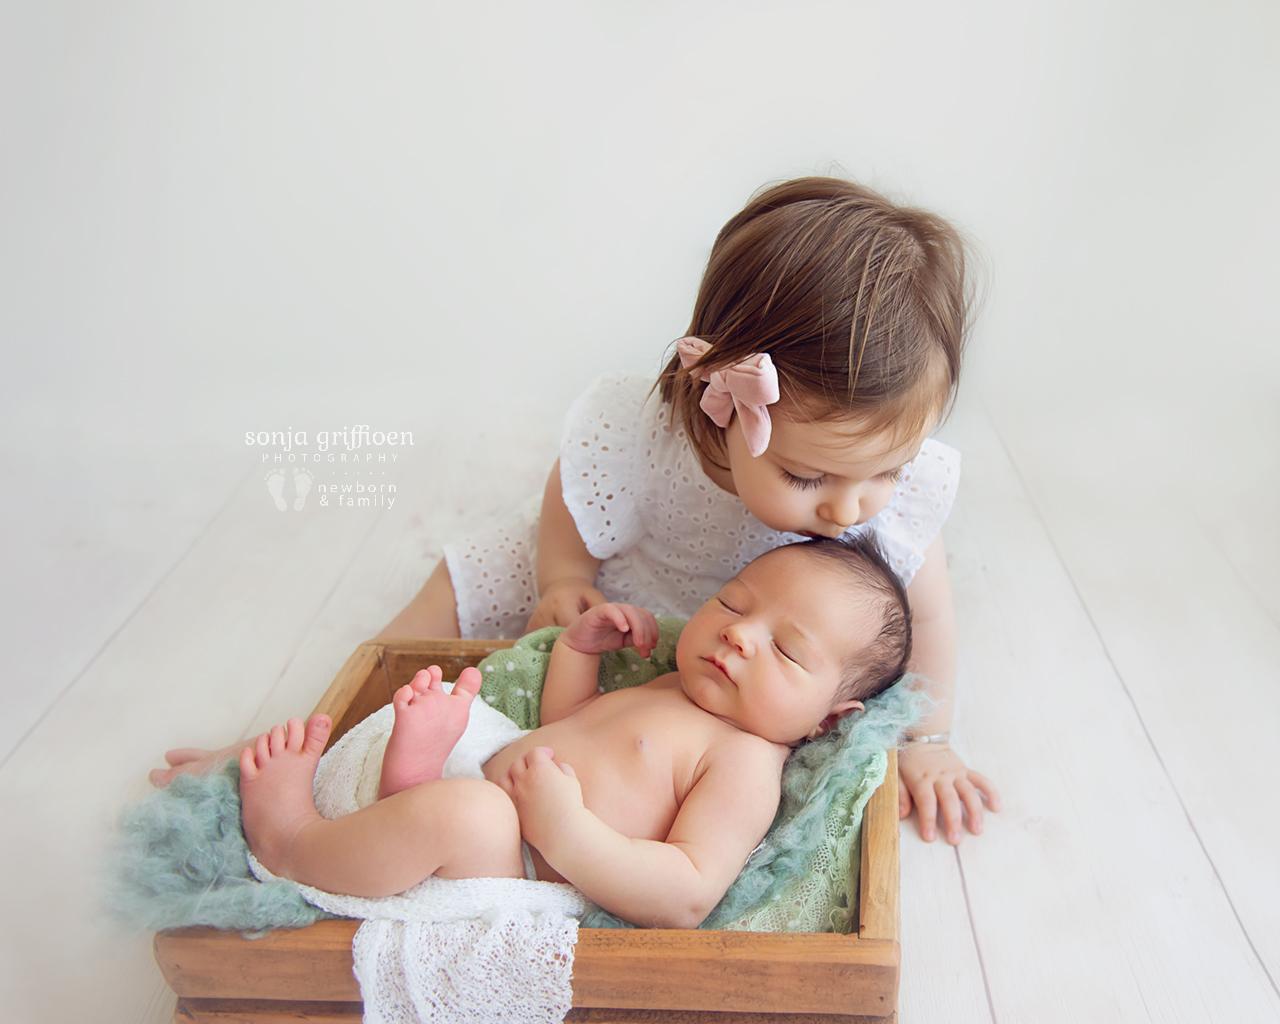 George-Newborn-Brisbane-Newborn-Photographer-Sonja-Griffioen-05.jpg